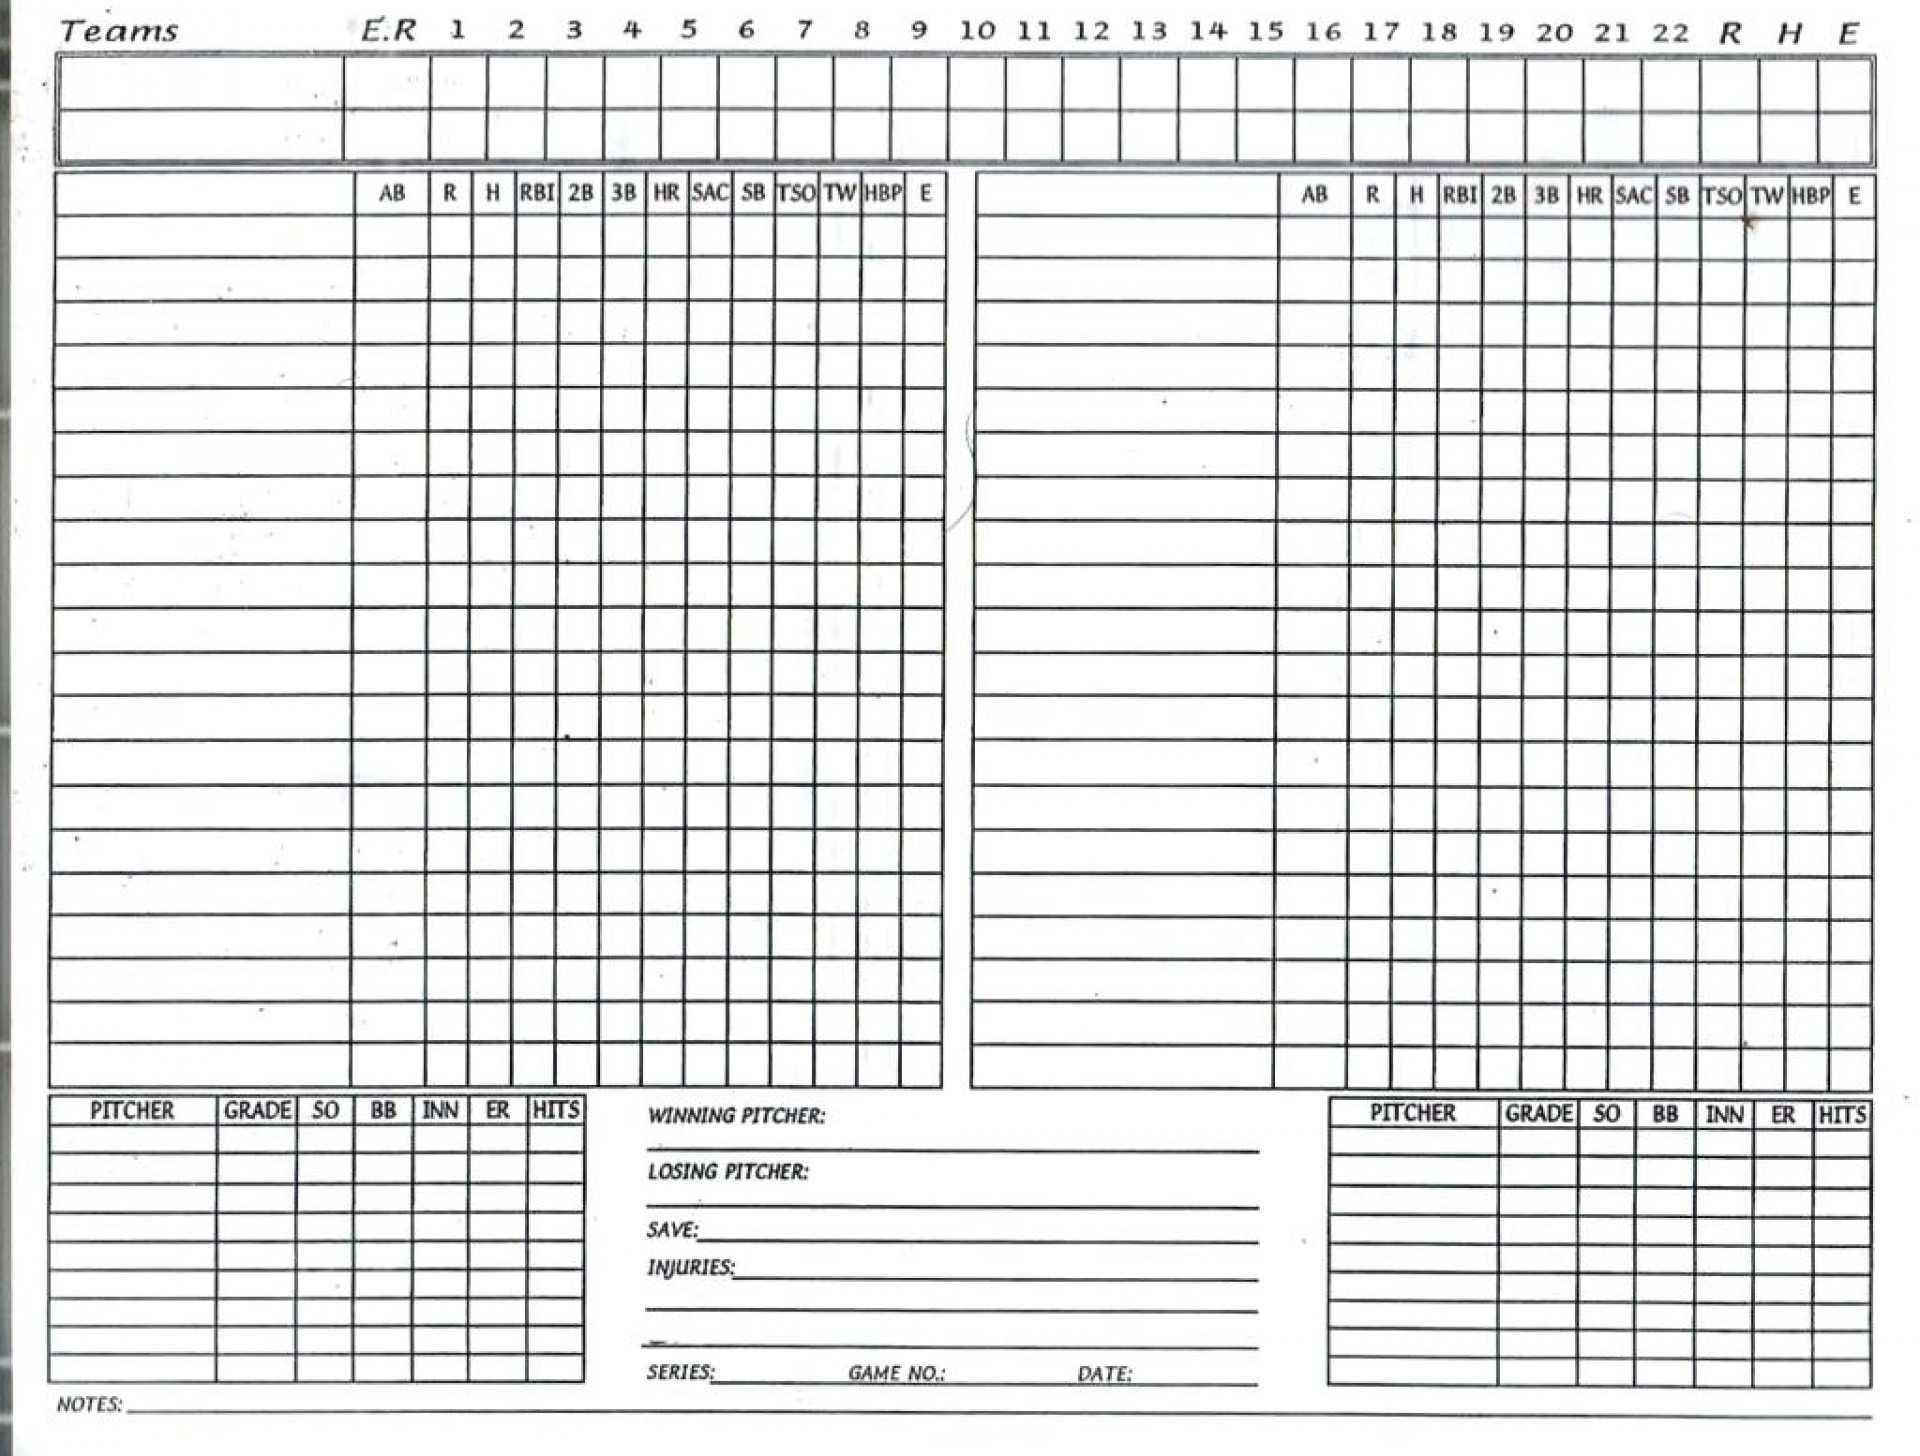 Free Baseball Stats Spreadsheet 008 Template Ideas Regarding with Free Baseball Lineup Card Template